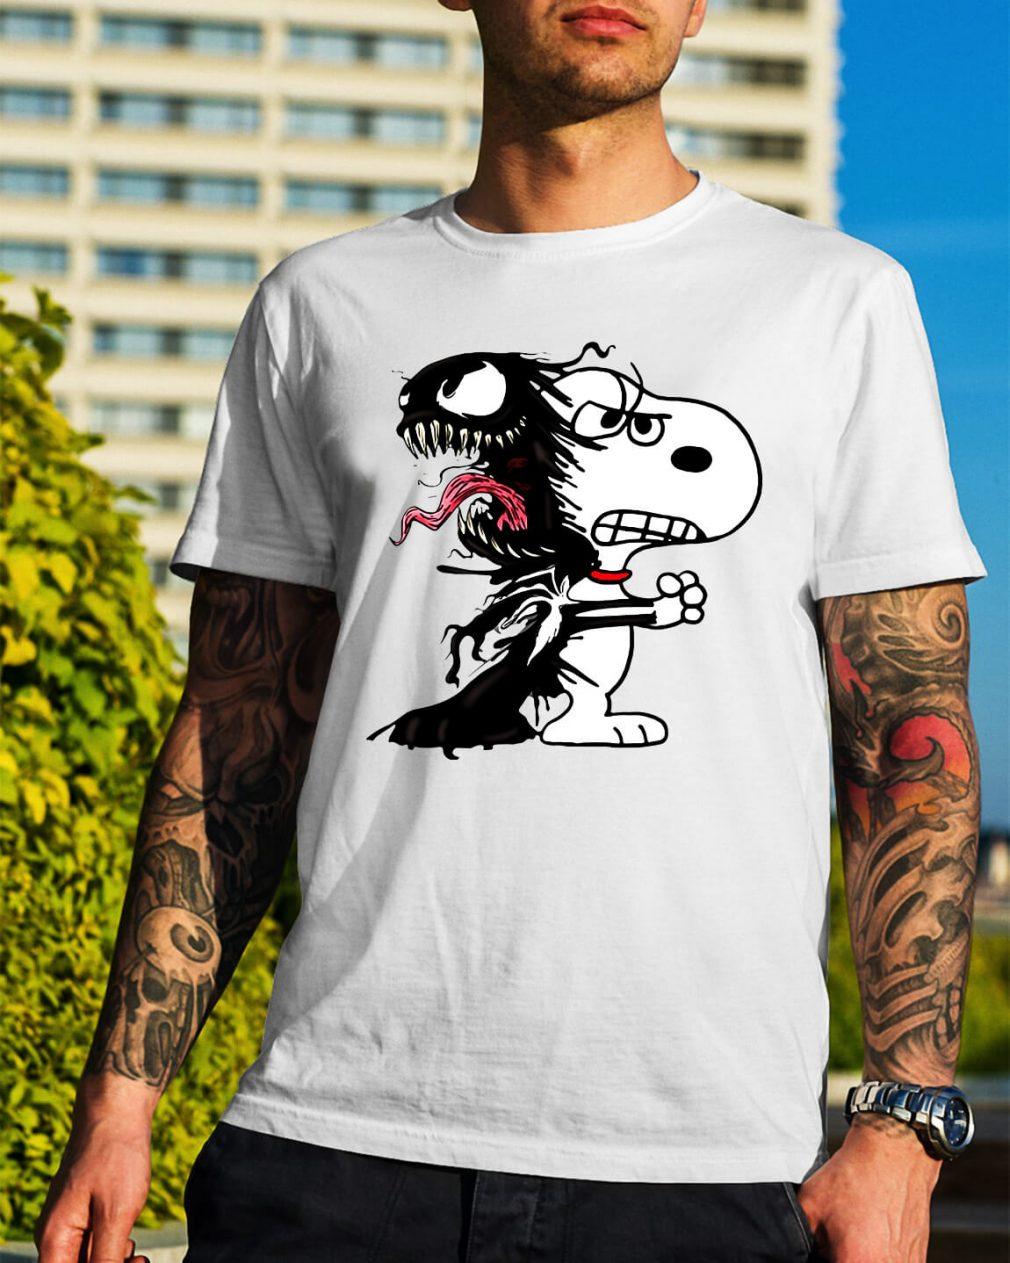 Venom and Snoopy shirt